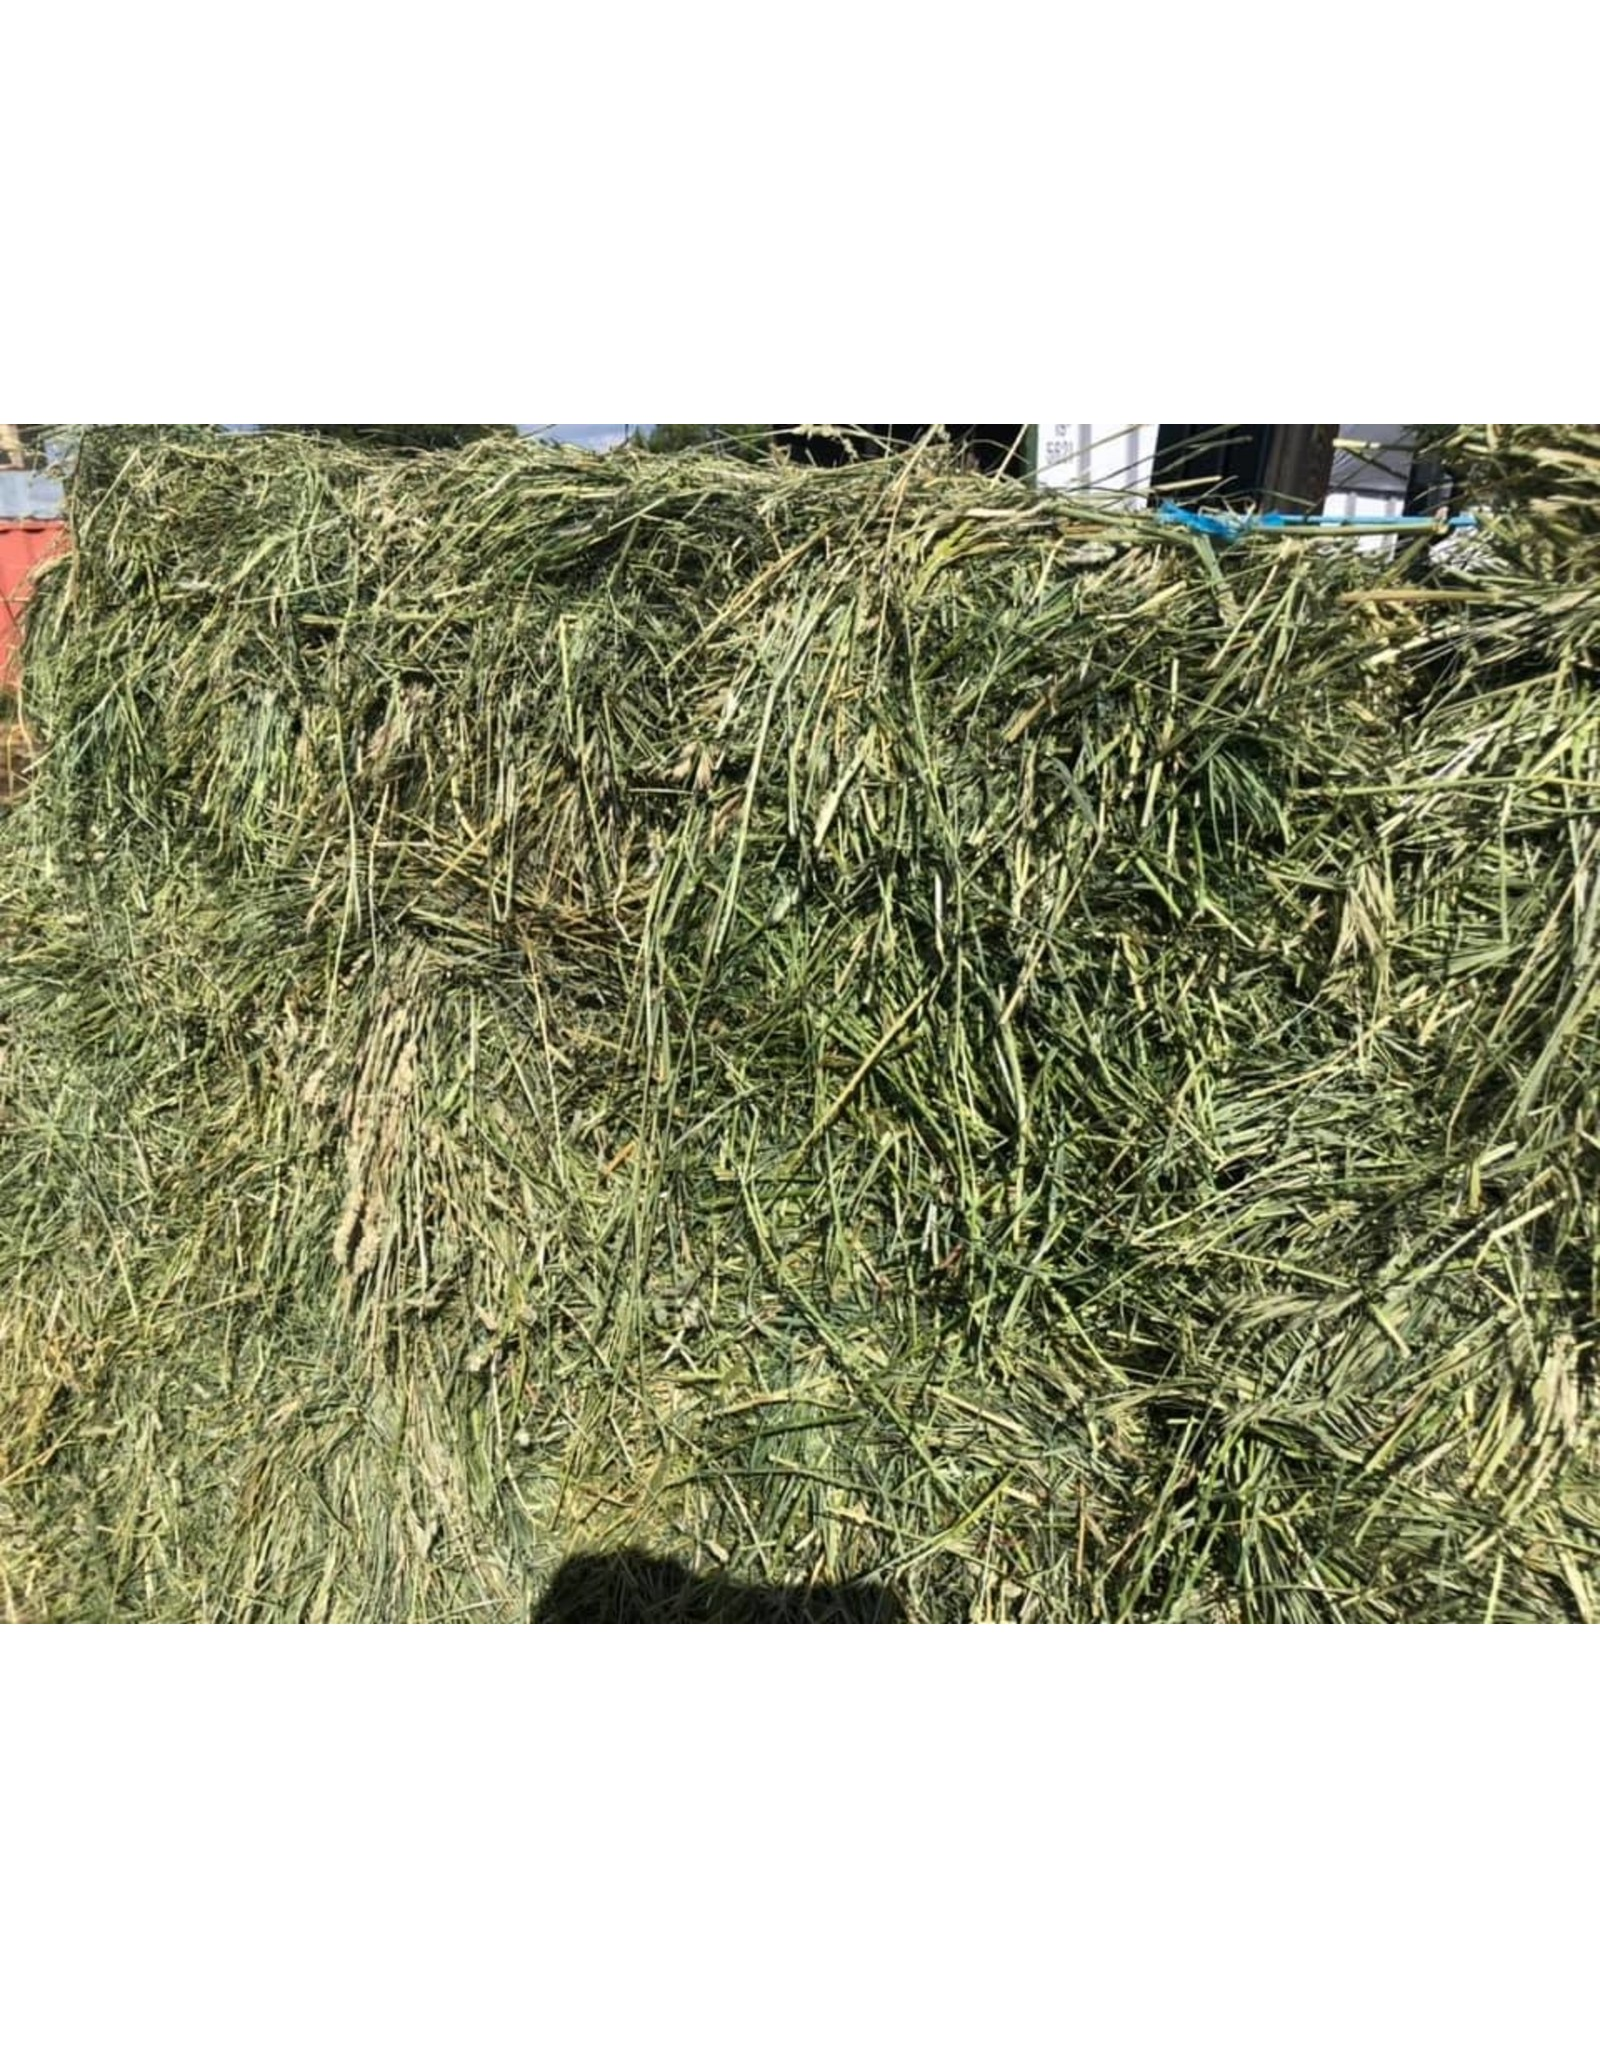 Montana O&A Heavy Alfalfa